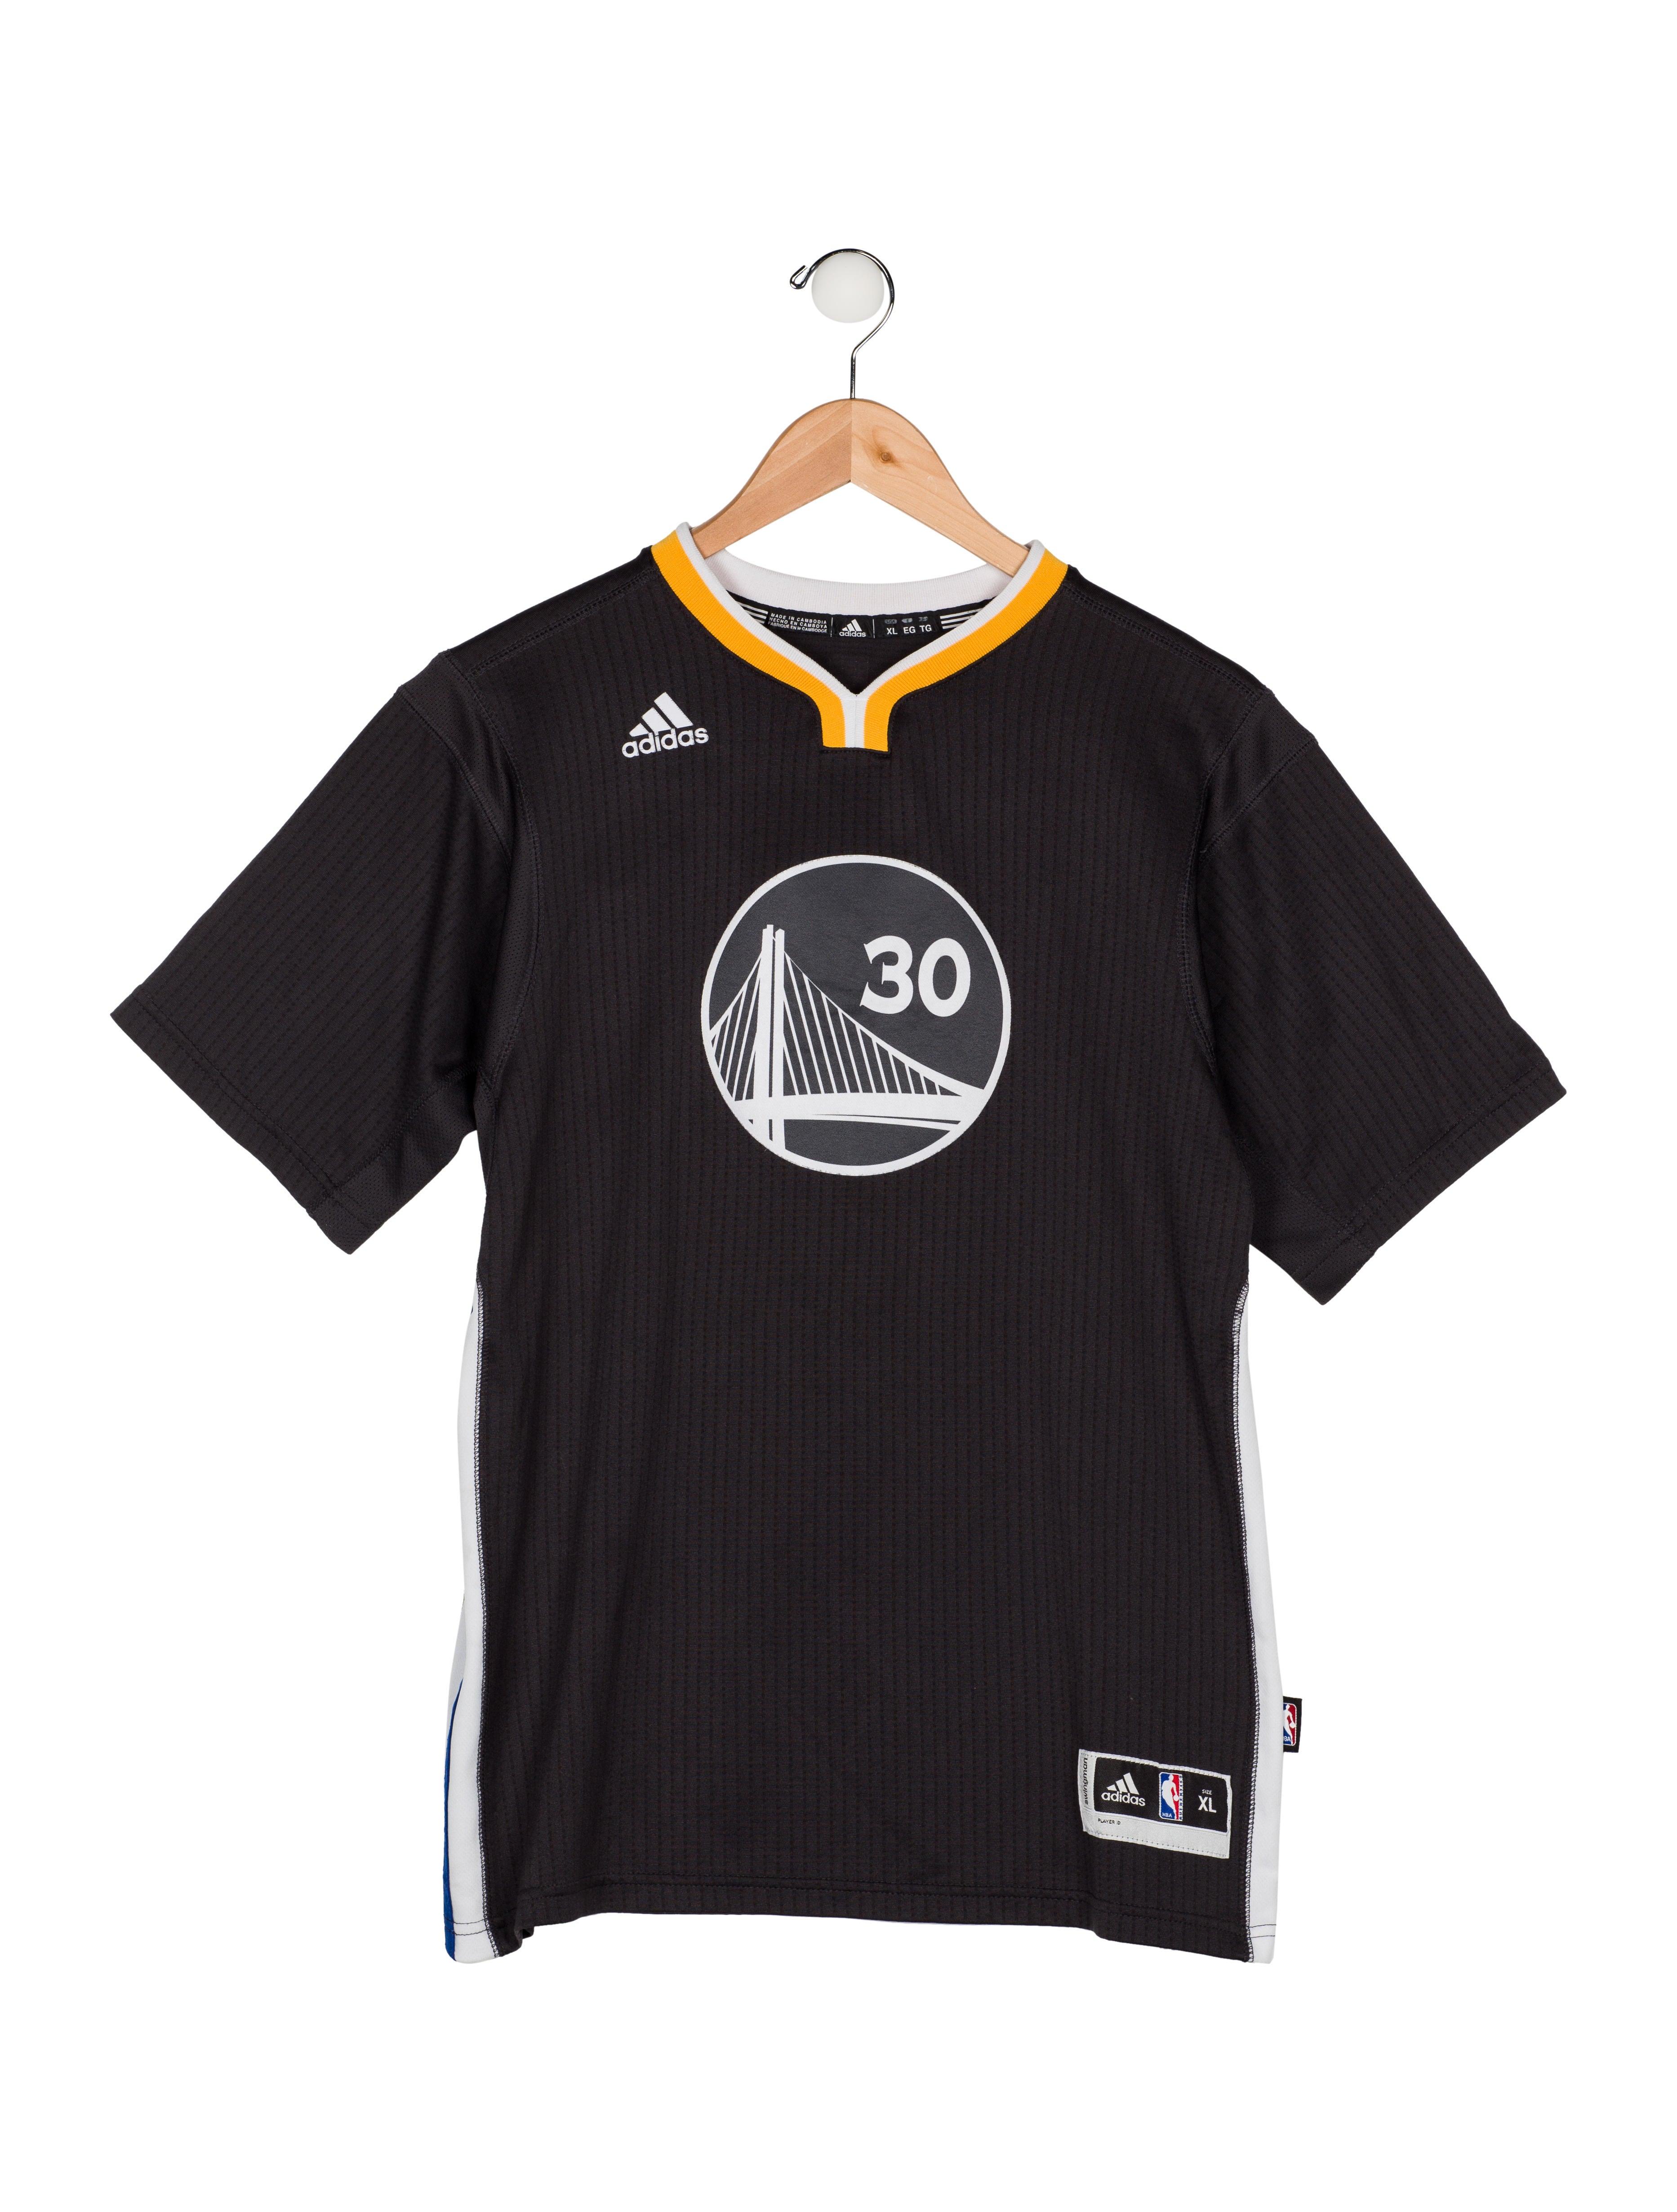 sale retailer 913ef 31cbc Boys' Golden State Warriors Jersey